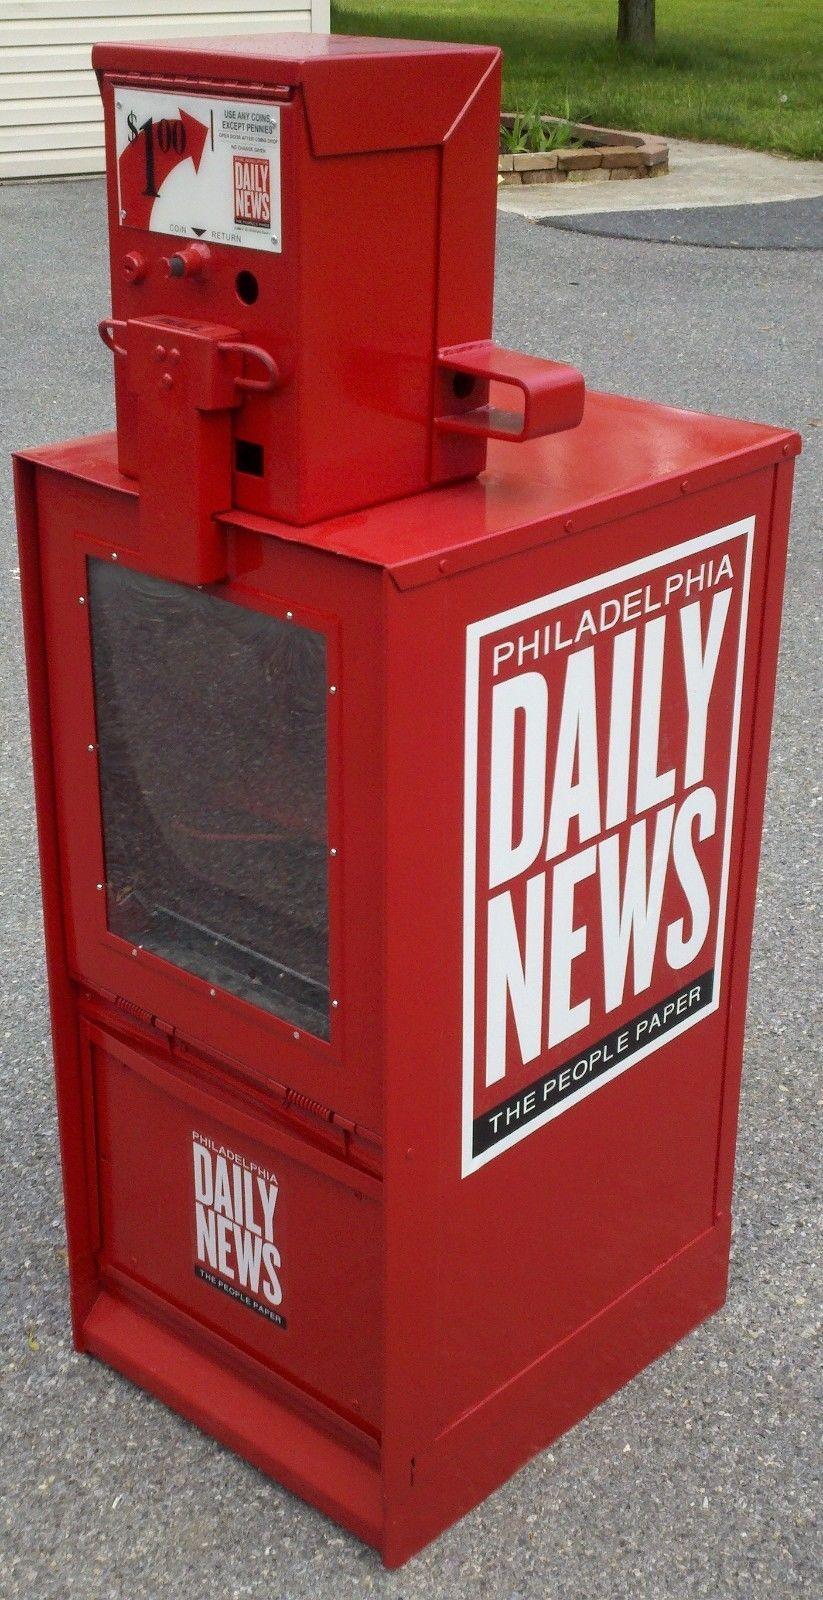 daily news paper for sale only 4 left at 65. Black Bedroom Furniture Sets. Home Design Ideas